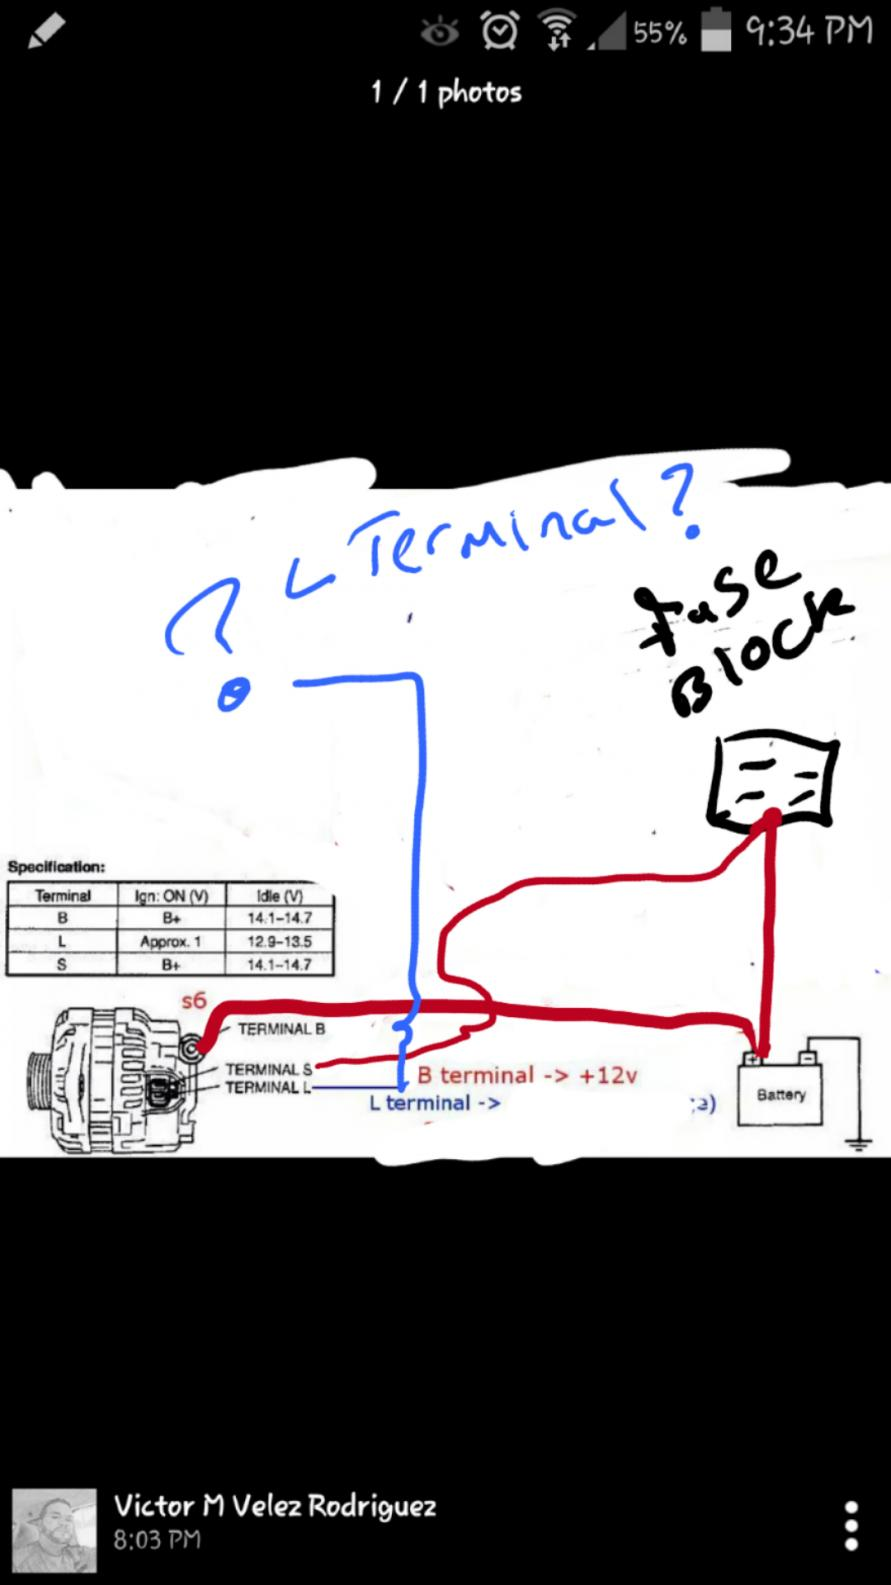 hight resolution of fd alternator wiring rx7club com mazda rx7 forum fd alternator wiring 2014 10 02 21 41